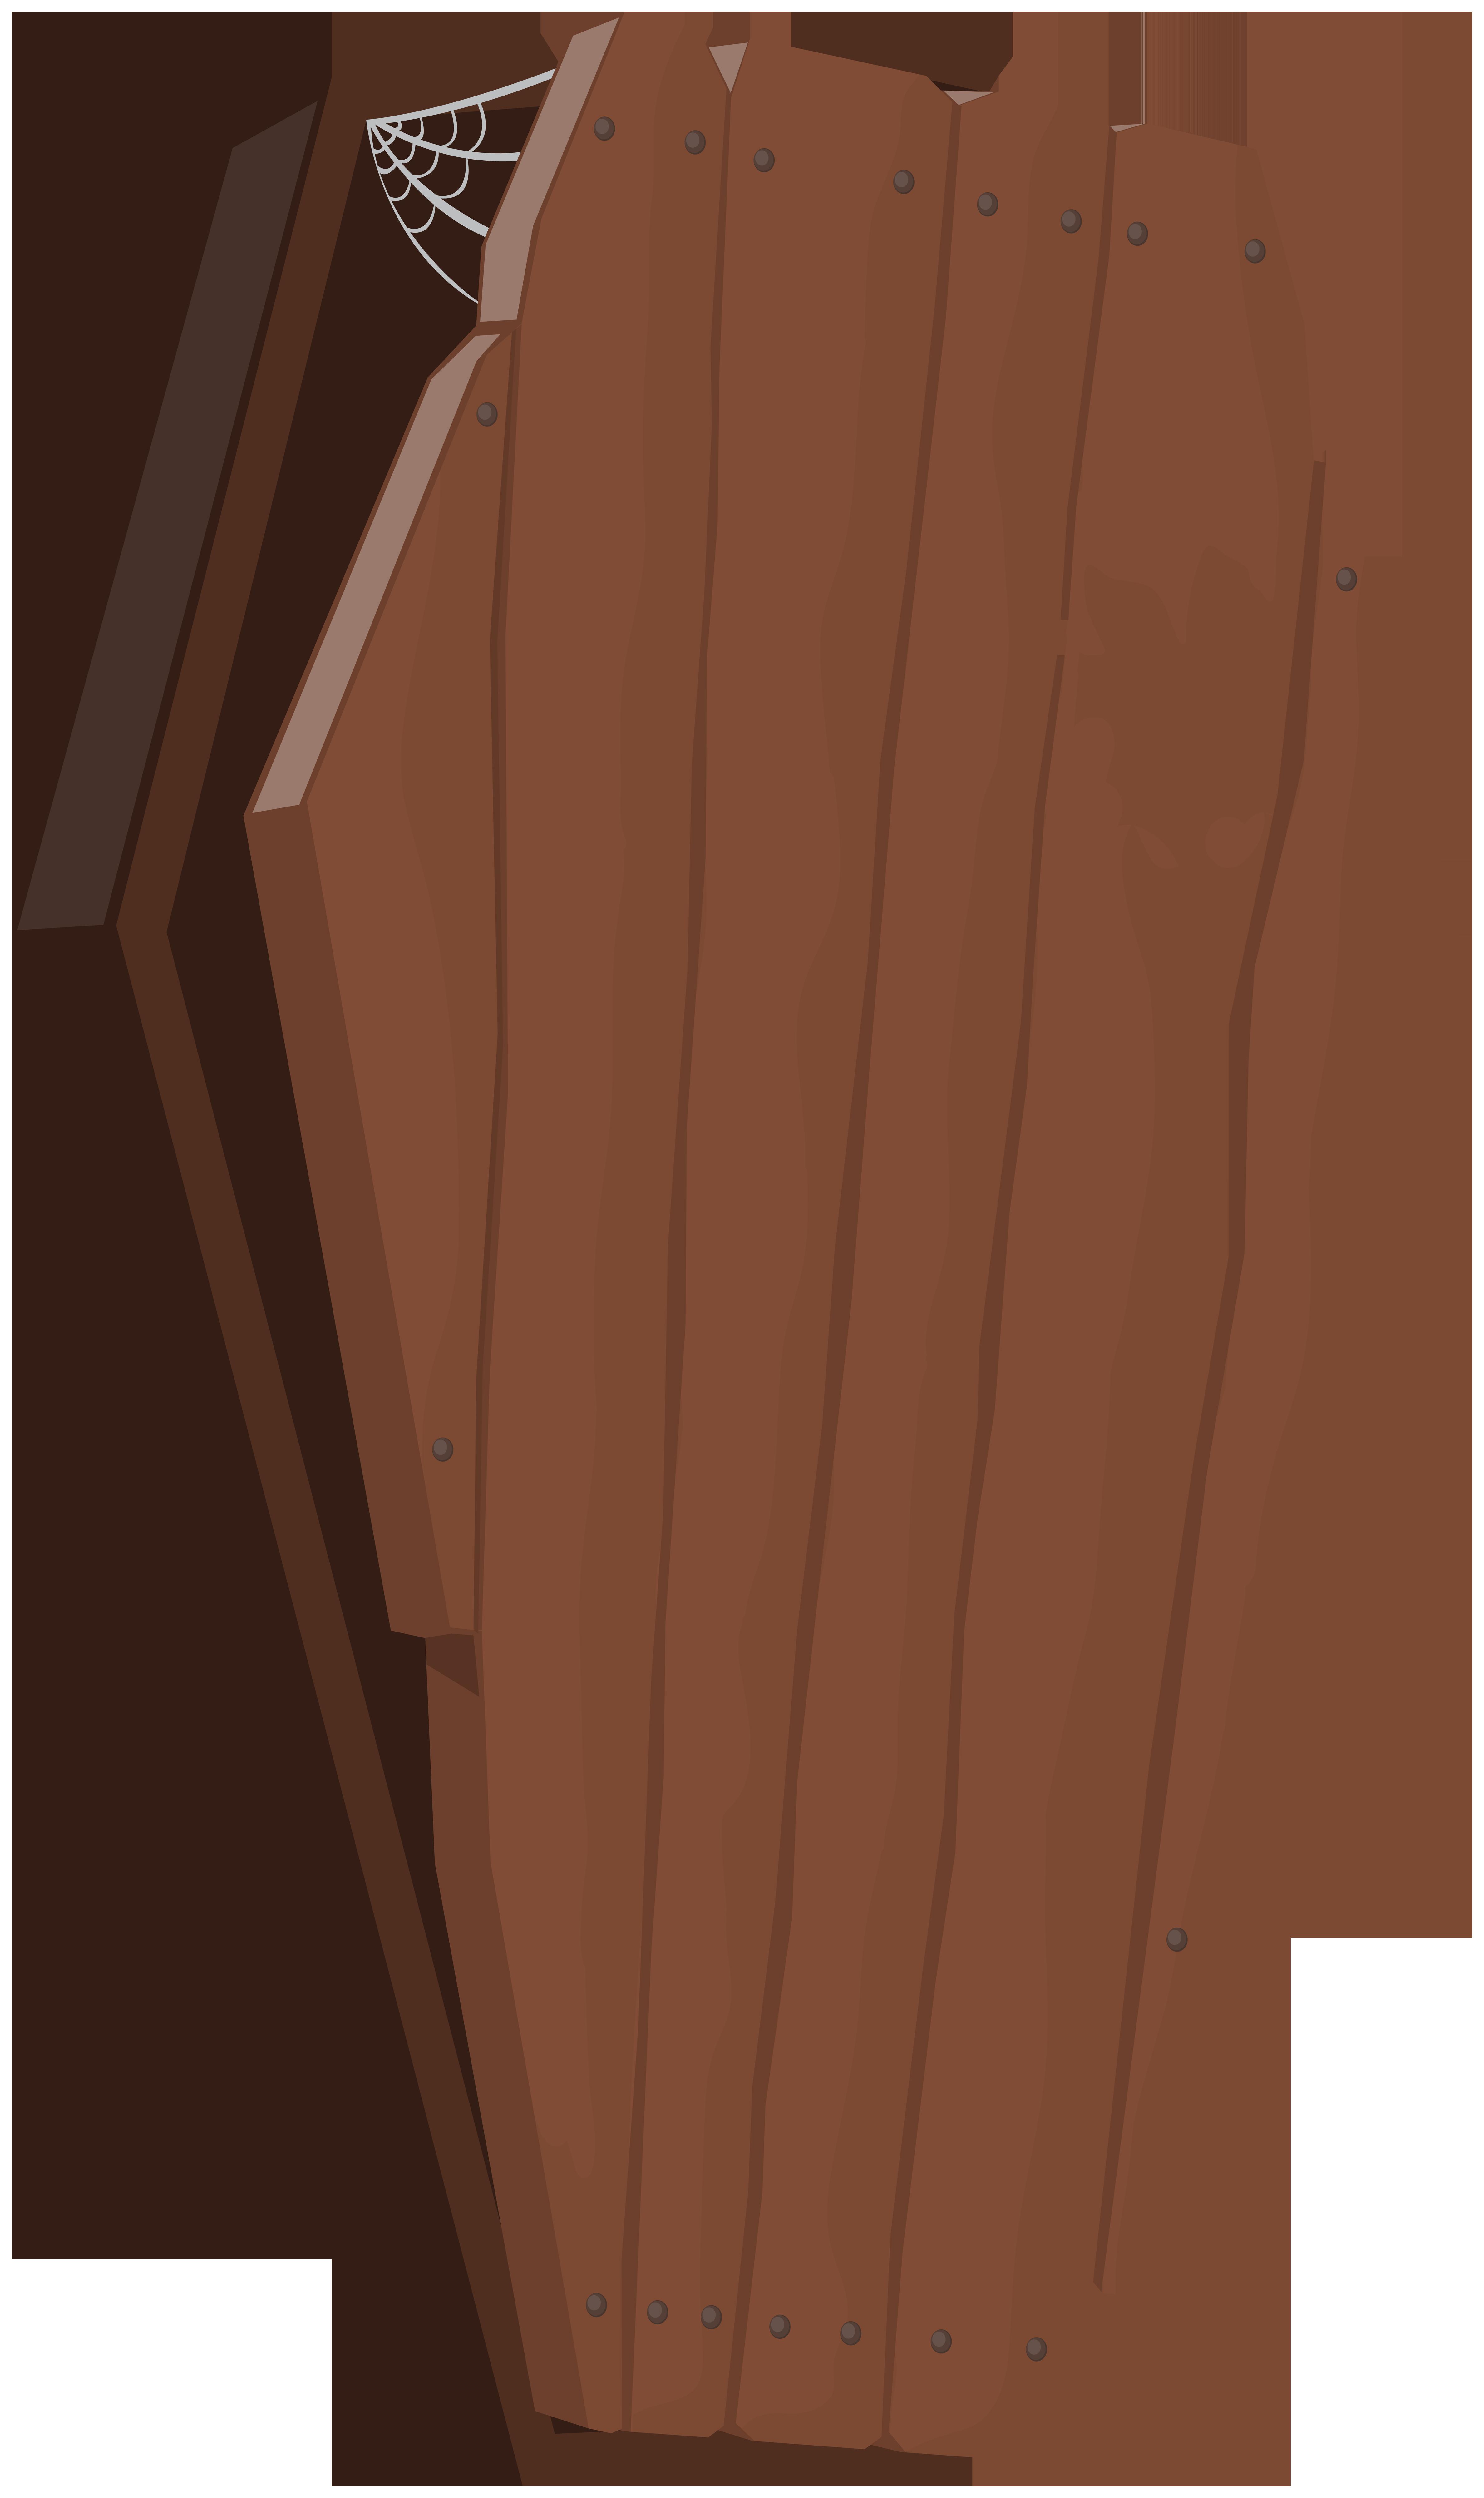 Old wooden clip art. Coffin clipart halloween